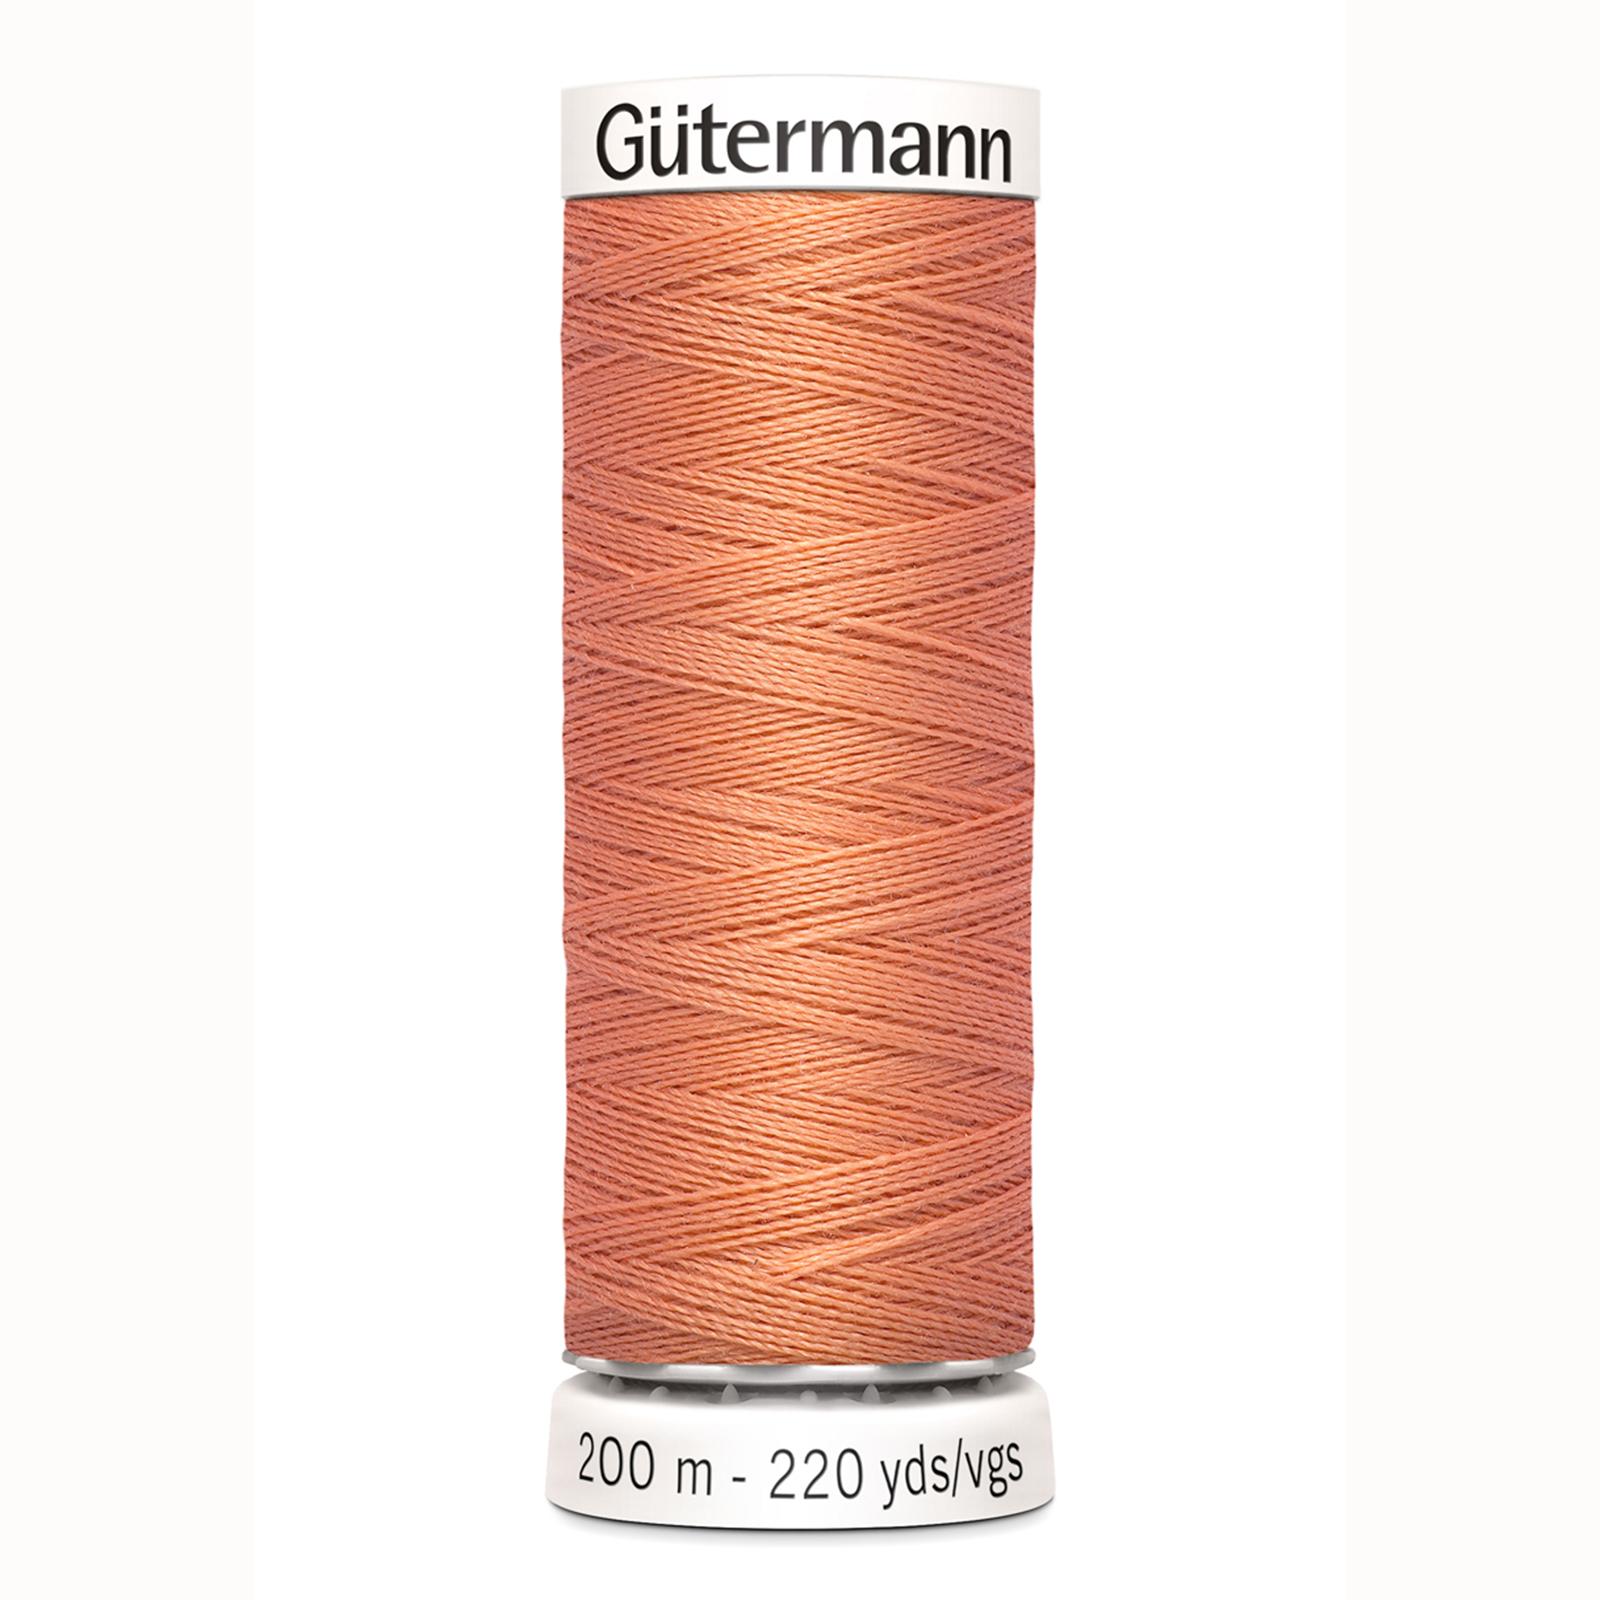 Gutermann Polyestr 200m-587